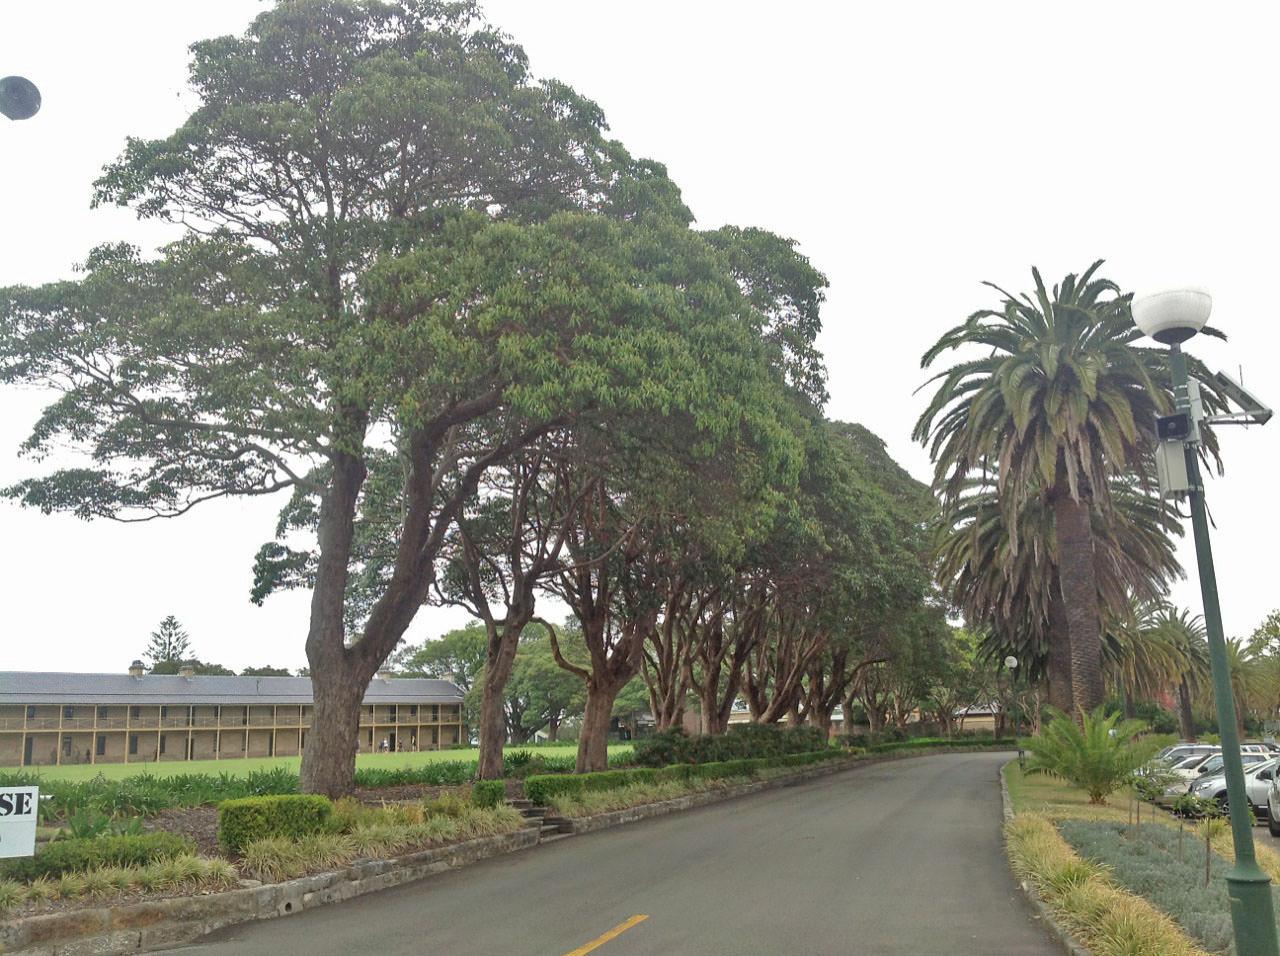 Brush Box and Canary Island Date Palms